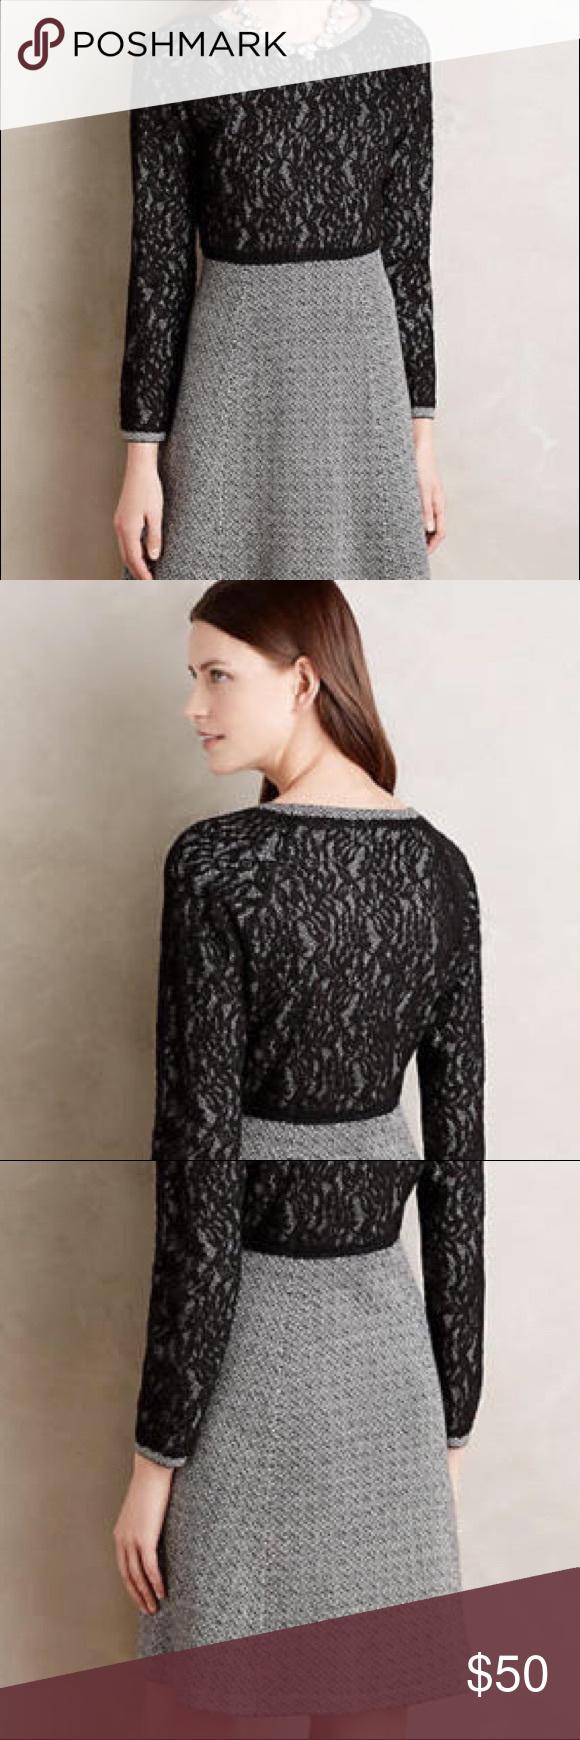 "Anthropologie Farah Lace Dress NWOT, Size XL. Falls 35"" from shoulder. Viscose, nylon, cotton, wool, cashmere knit. Lace overlay detail. Anthropologie Dresses Long Sleeve"